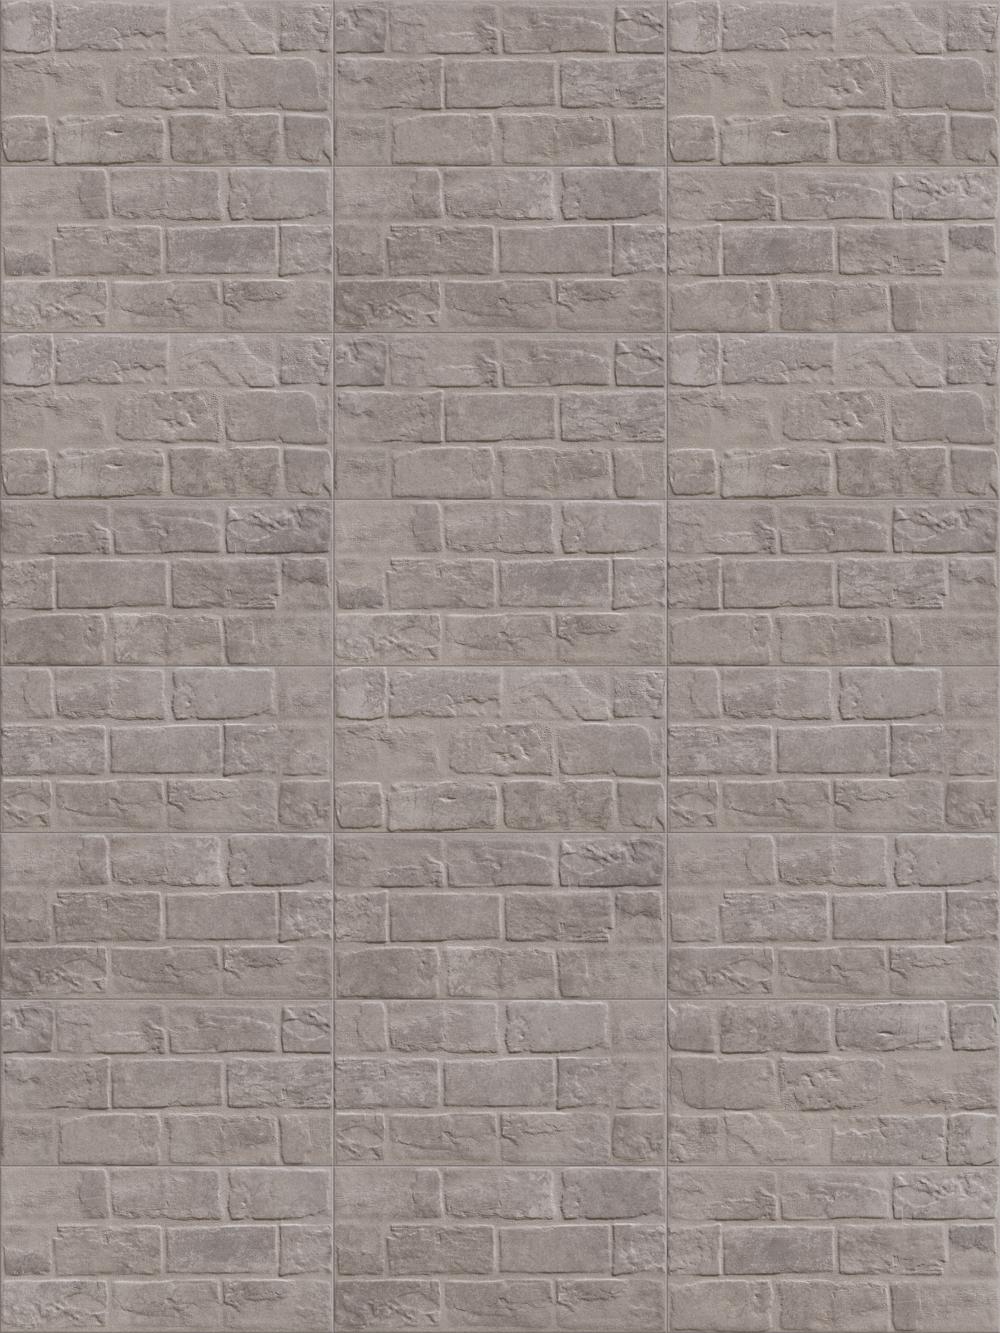 Cork_Brick.png